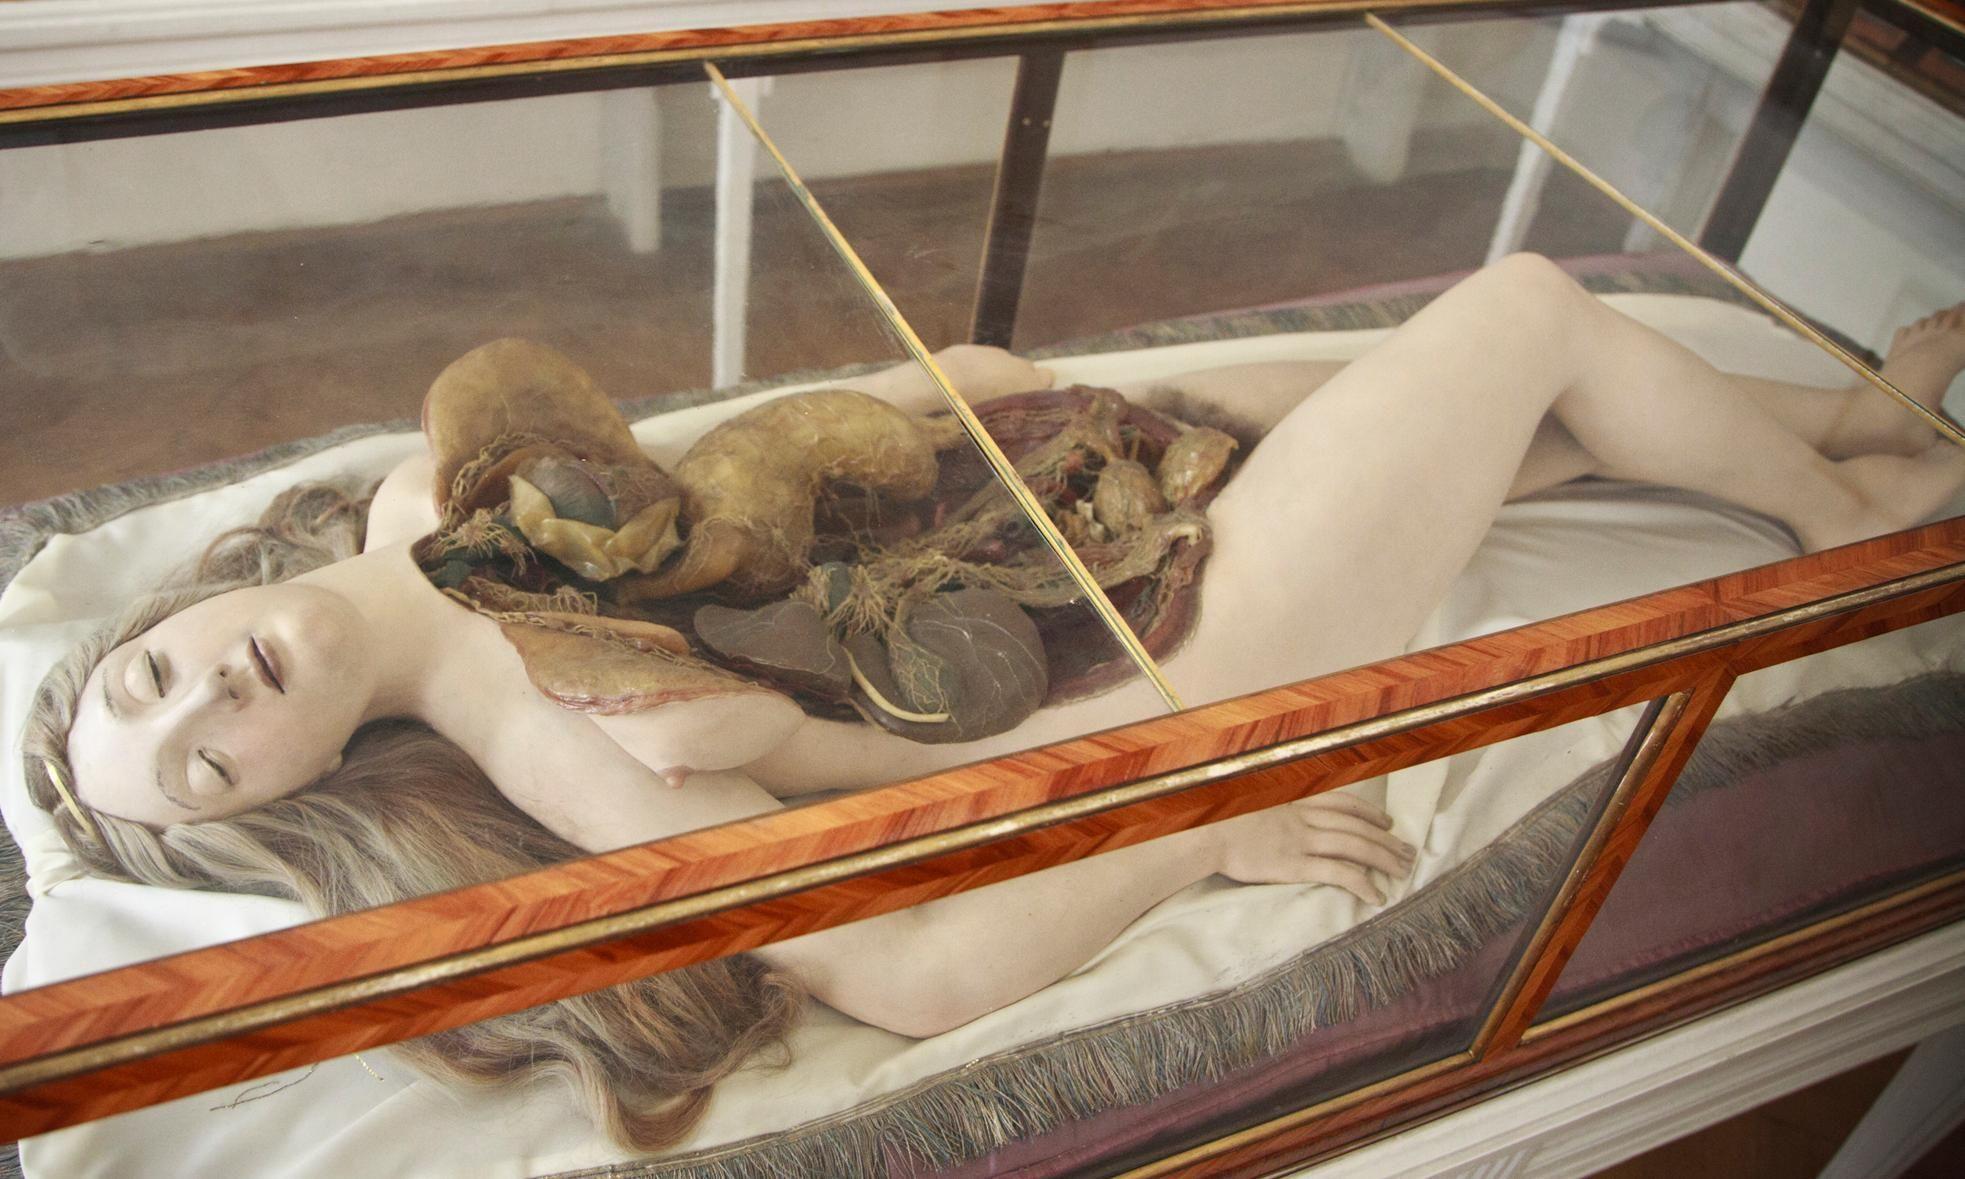 Cadavers in pearls: meet the Anatomical Venus | ART | Pinterest